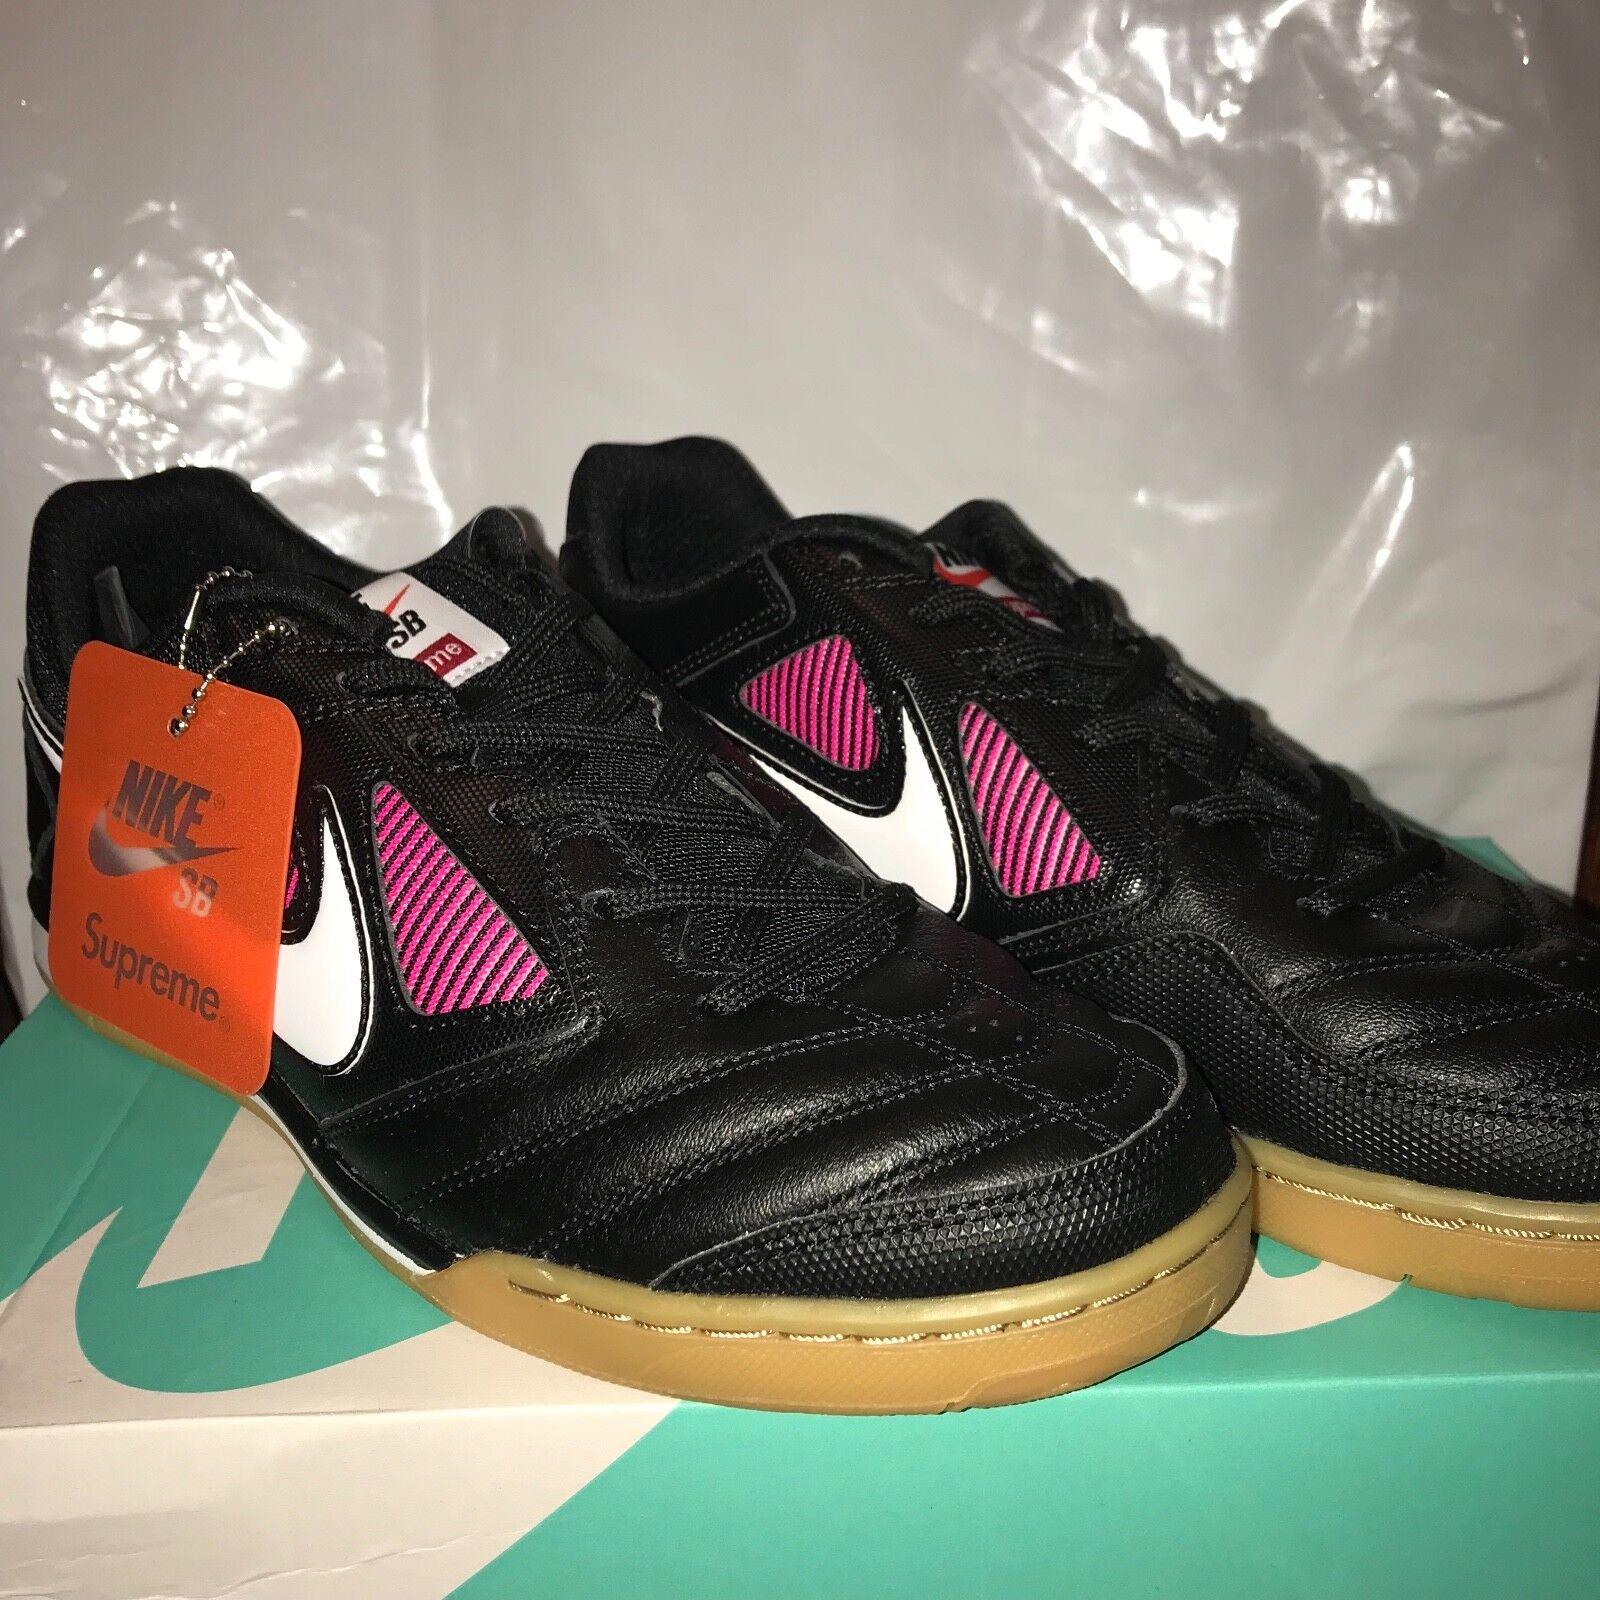 Supreme X Nike SB Gato - Black Purple - US Mens Size 8 - Send Offers